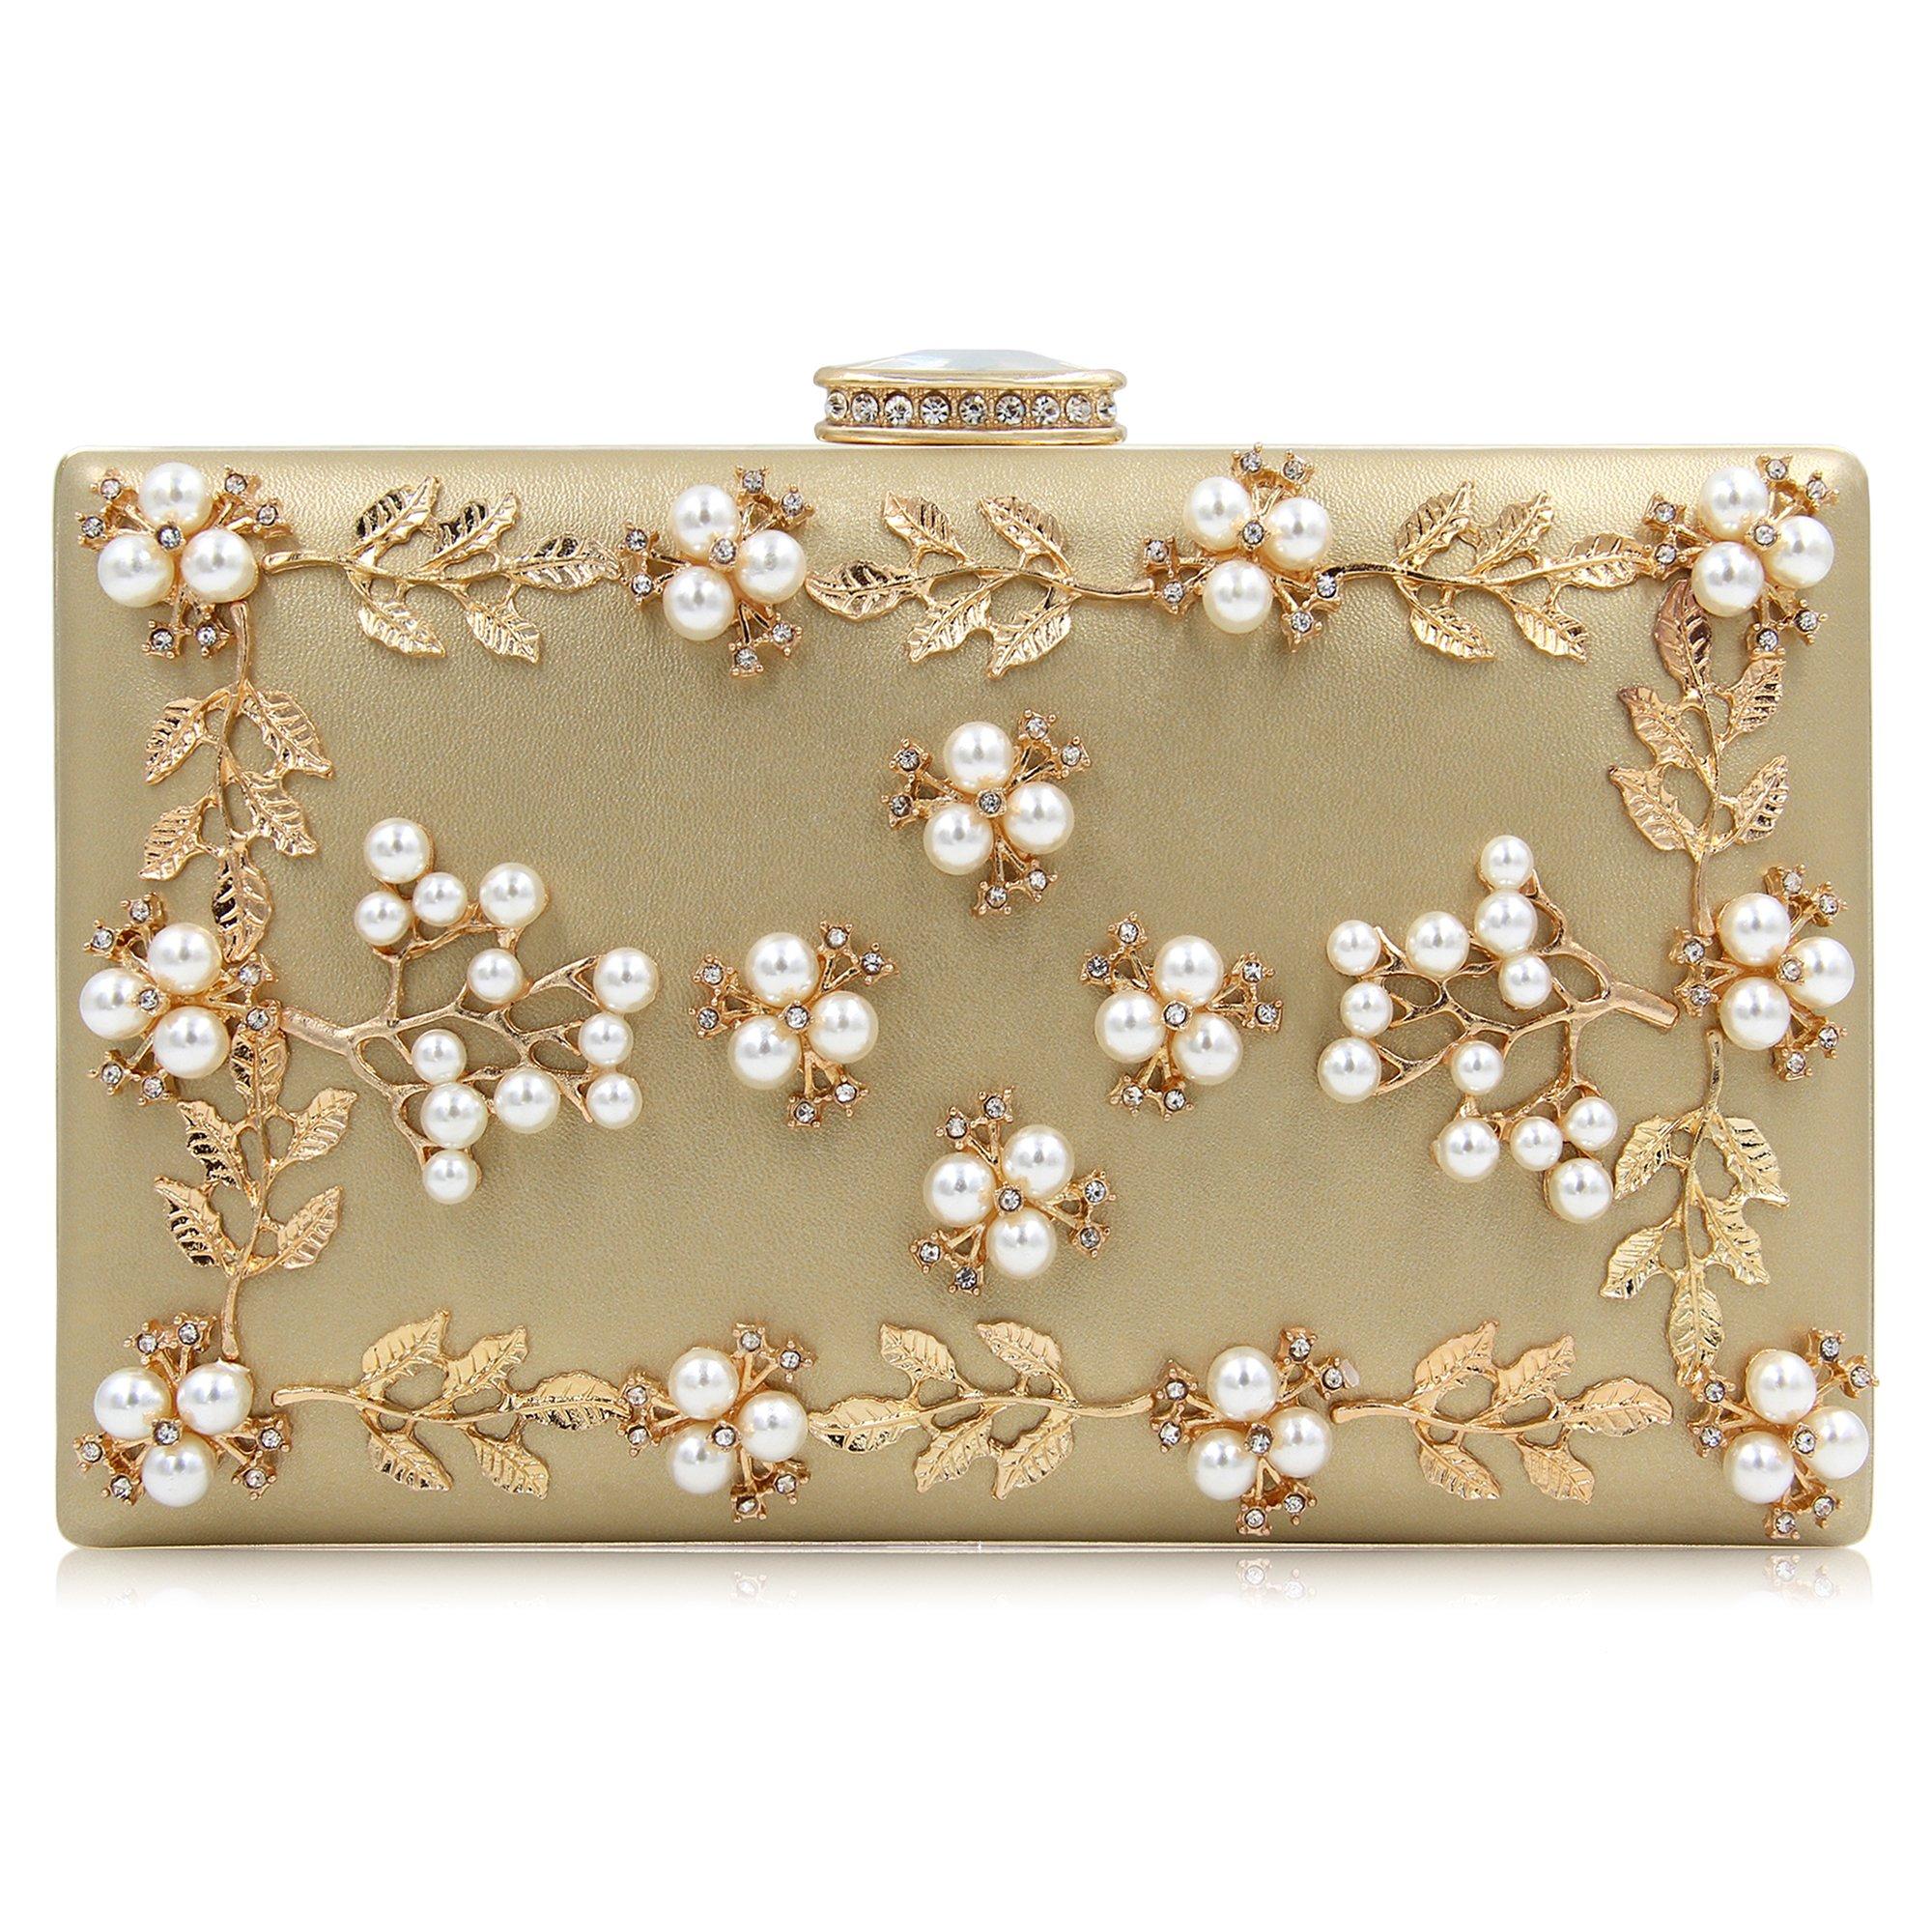 Milisente Women Clutches Pearls Evening Bag Clutch Purse Bags (Gold)